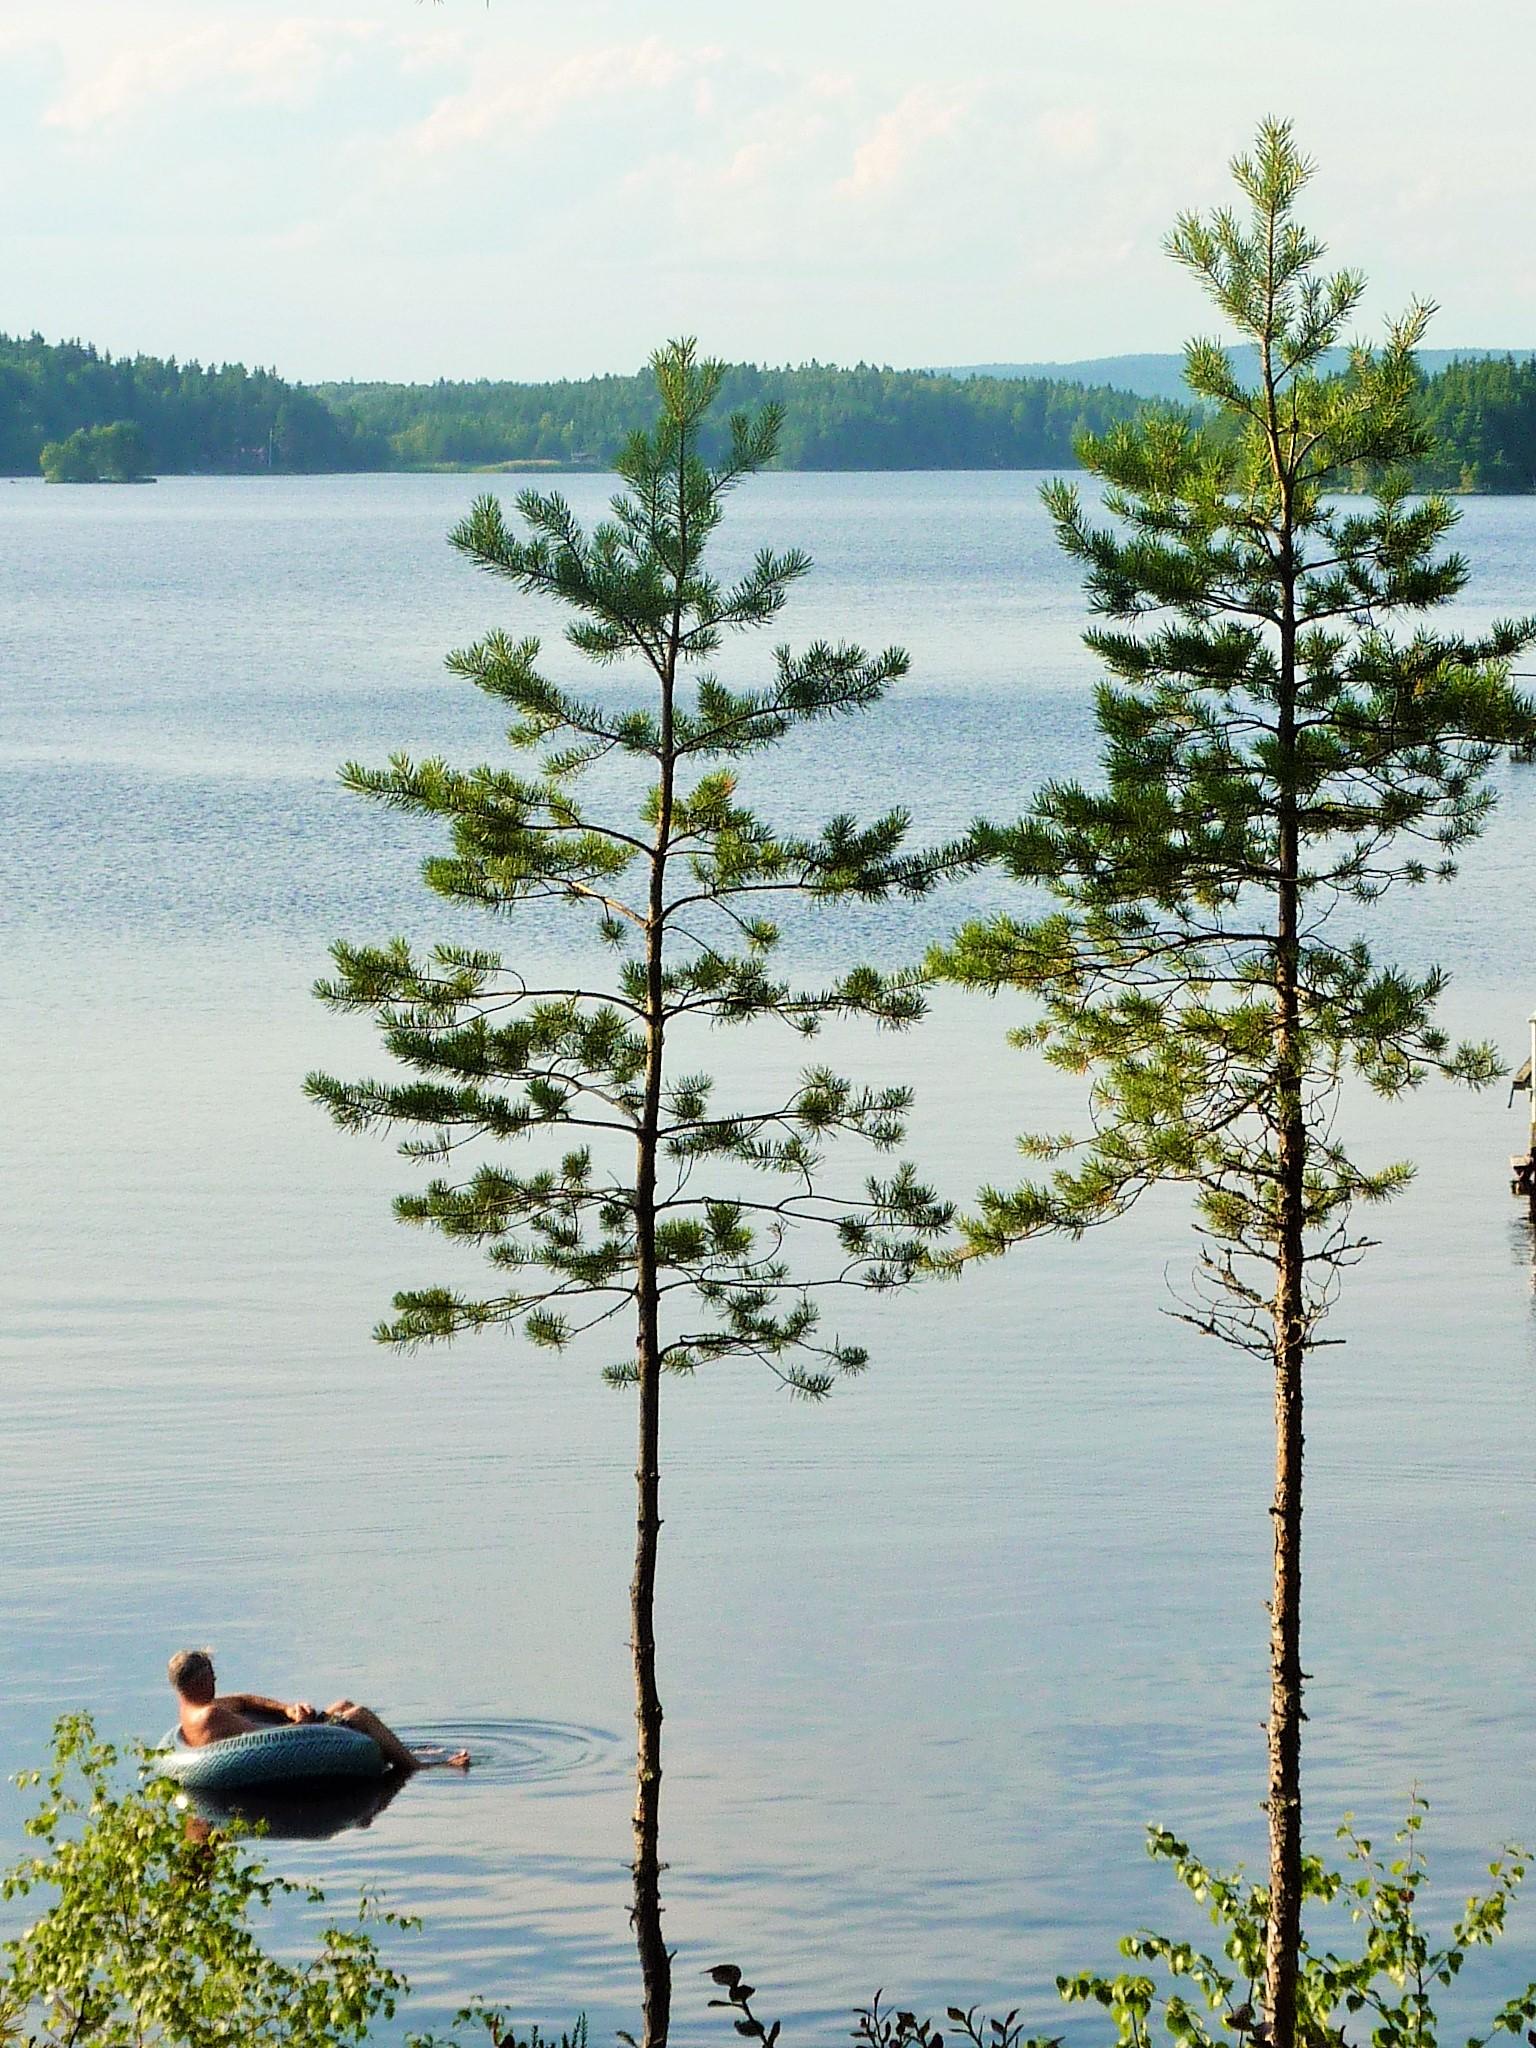 Summer at Lake Runn, Sweden